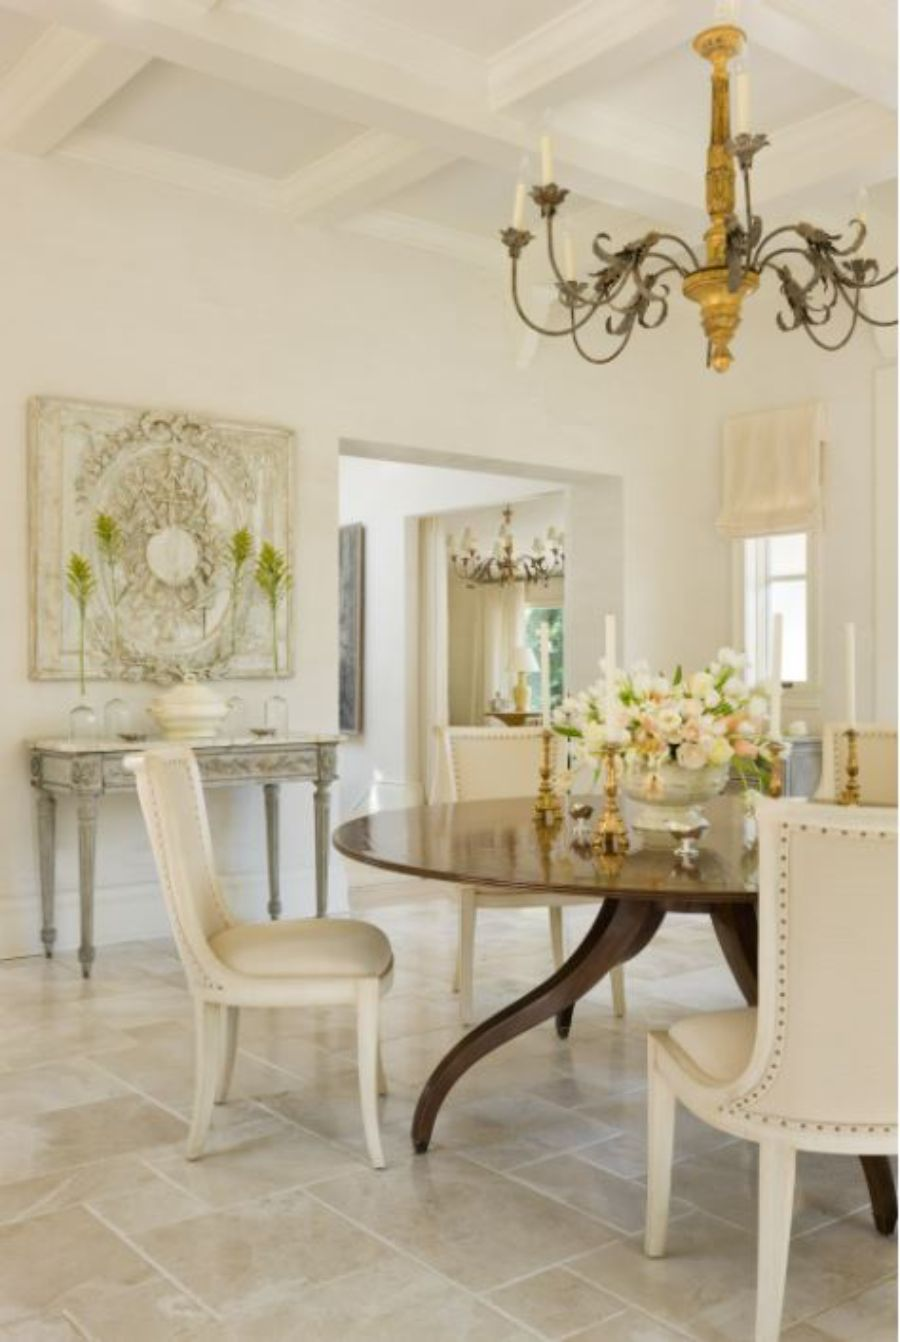 Solis Betancourt and Sherill, Refined Interior Design Trends solis betancourt and sherill Solis Betancourt and Sherill, Refined Interior Design Trends Arlington